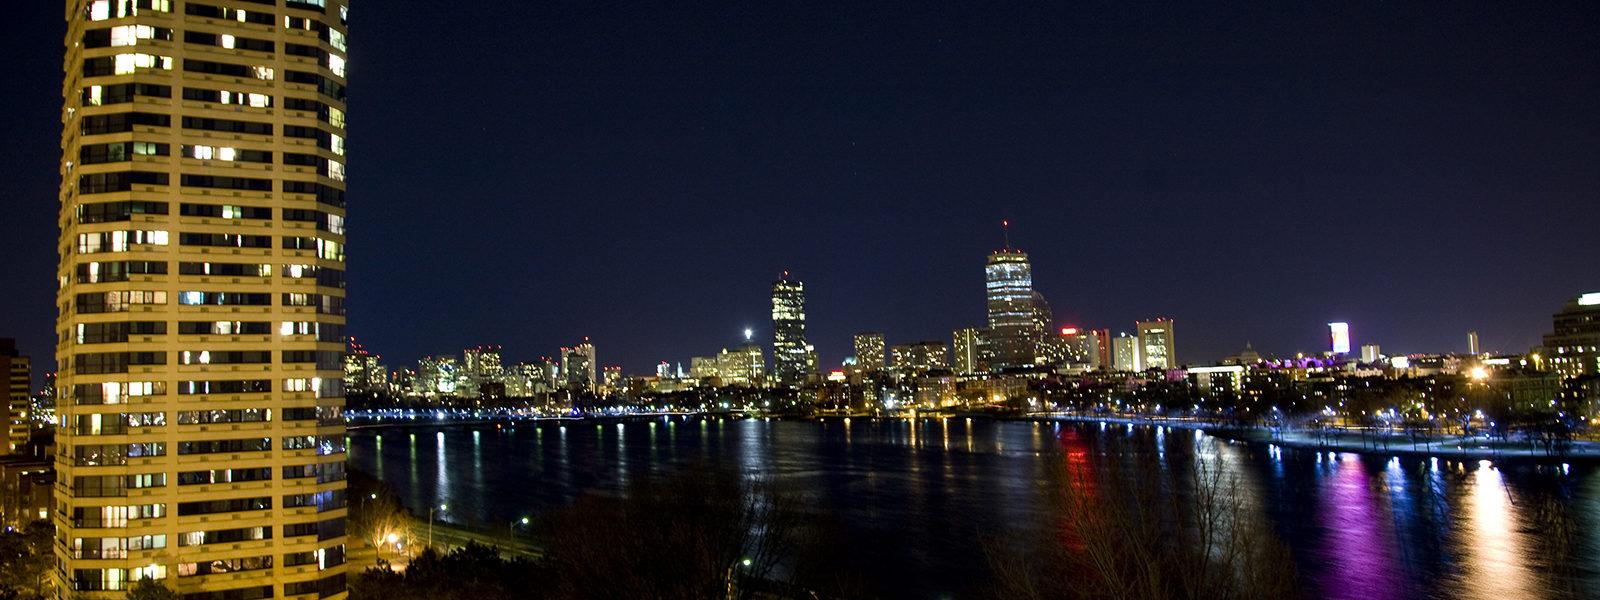 City scape of Boston, Mass by photographer Bob Gross